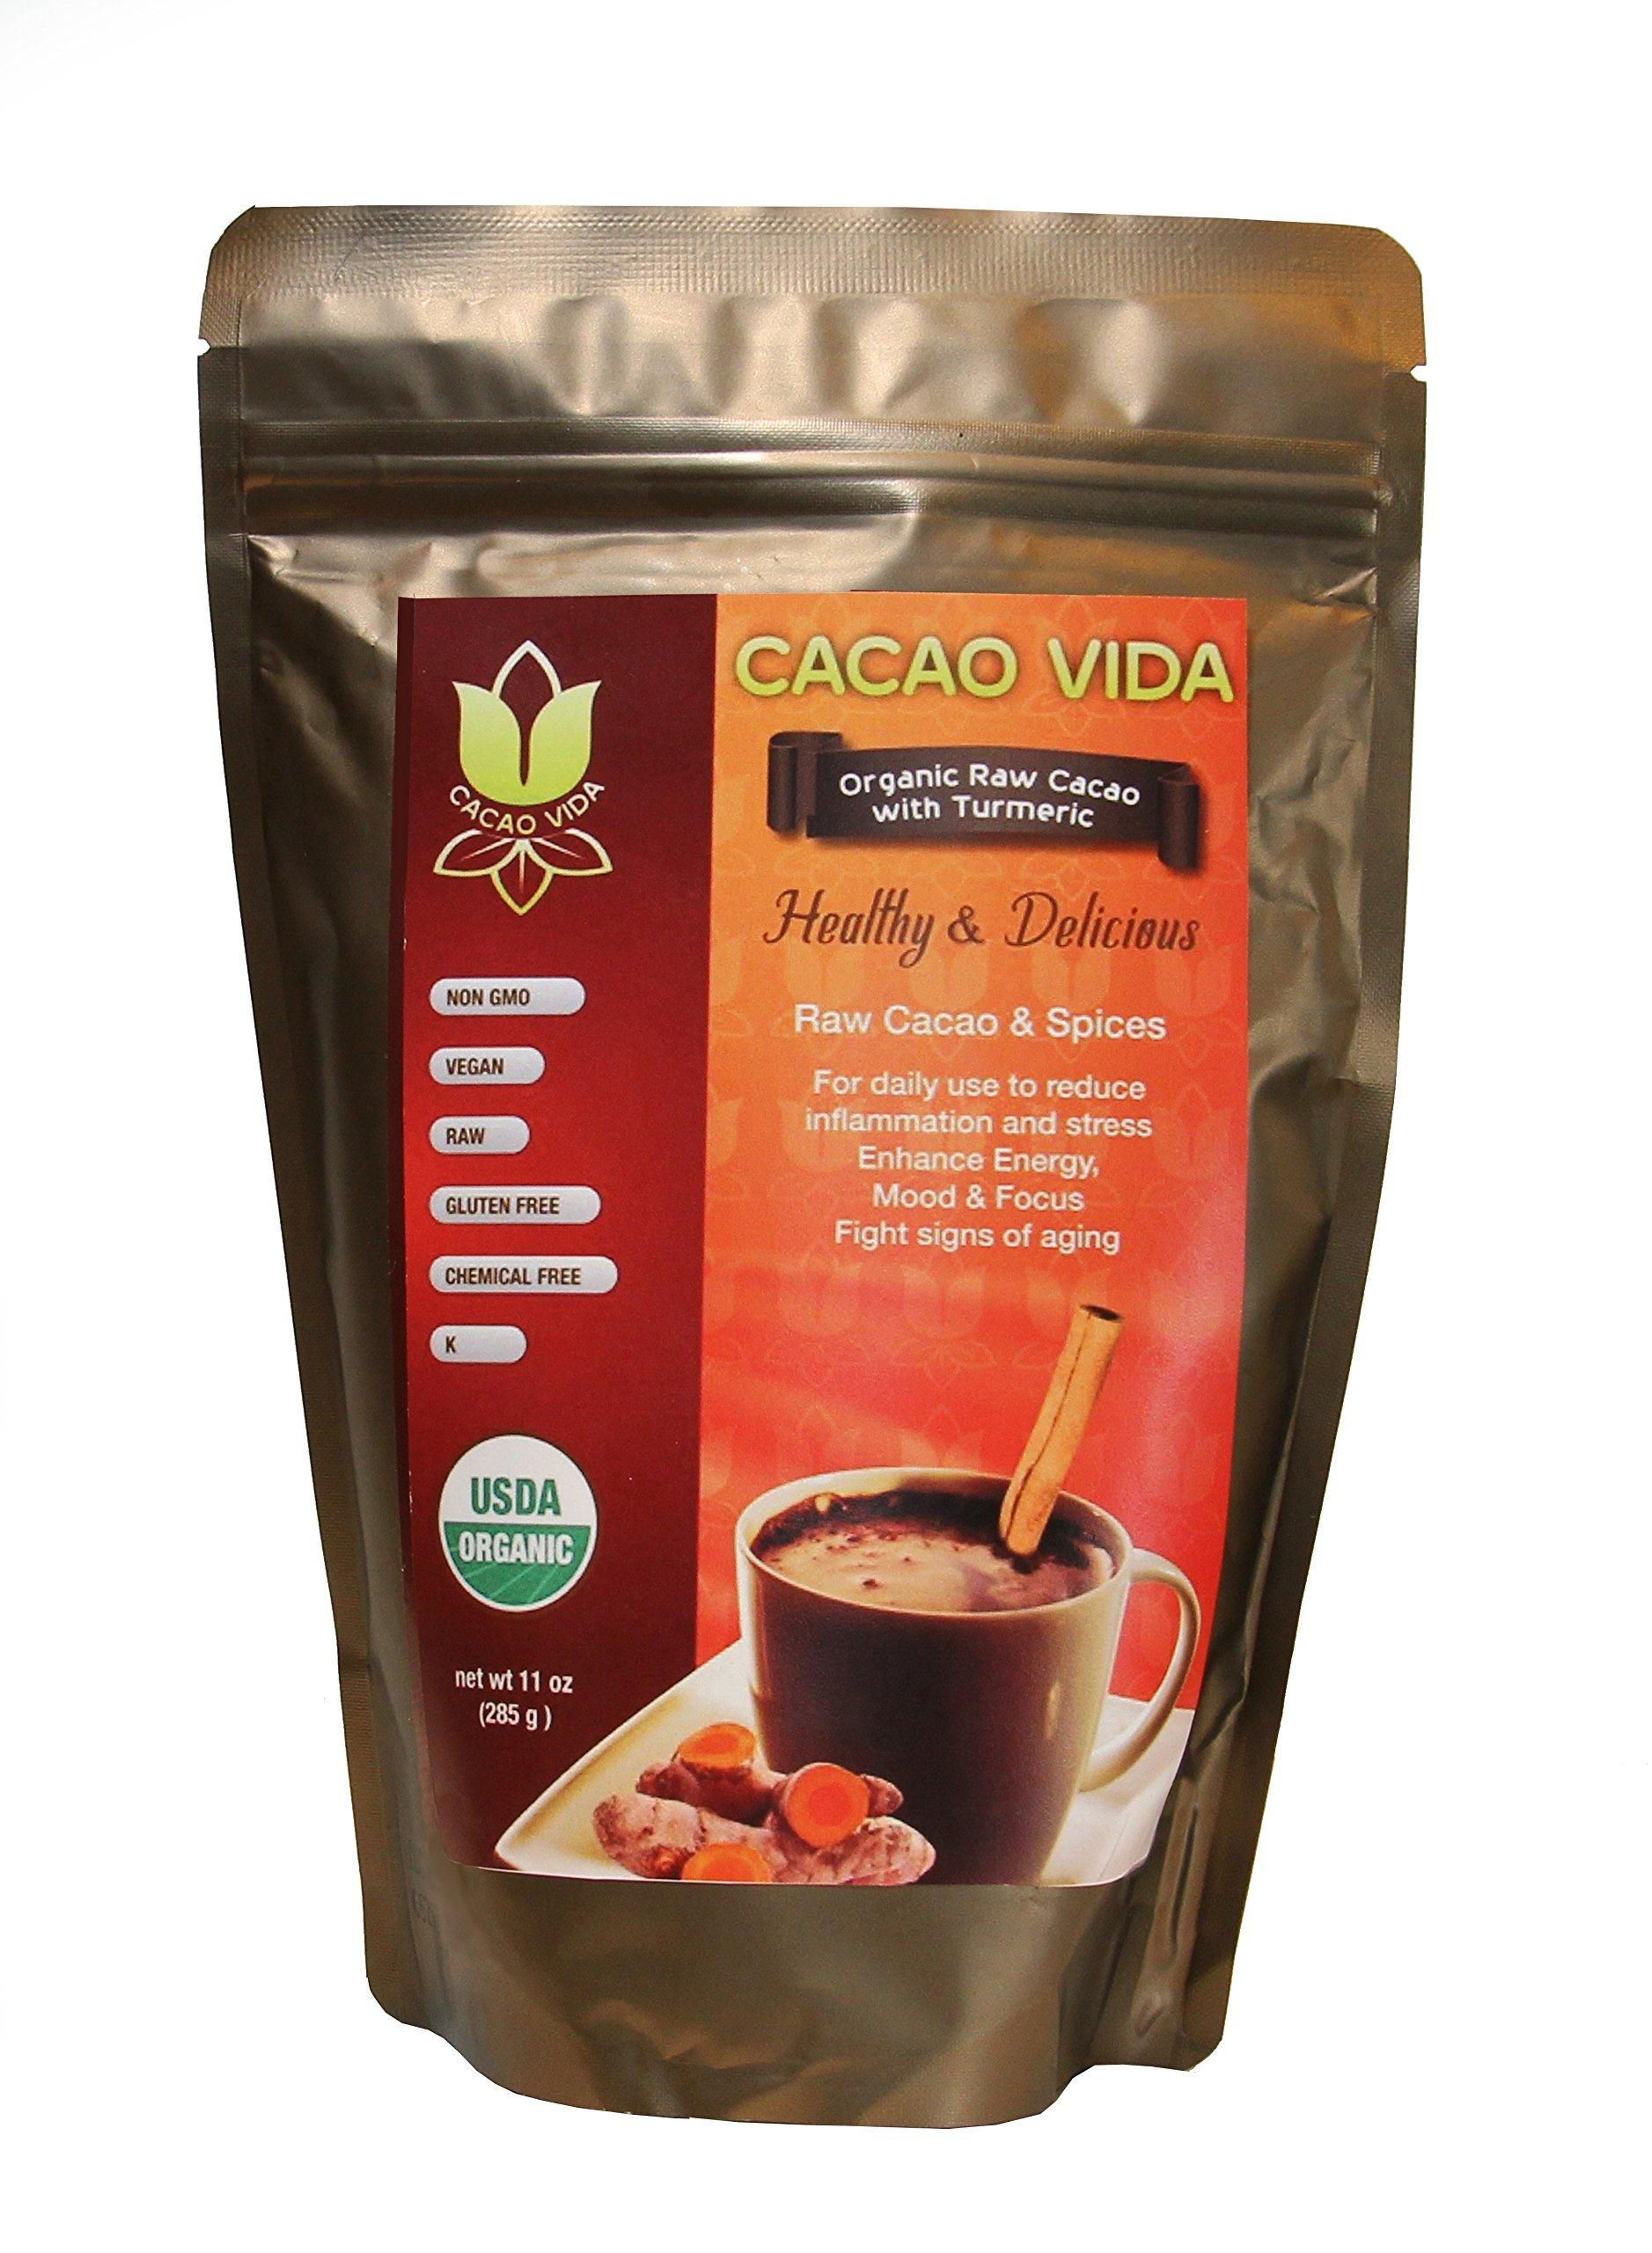 Organic Cacao Powder with Turmeric by Cacao Life Organics